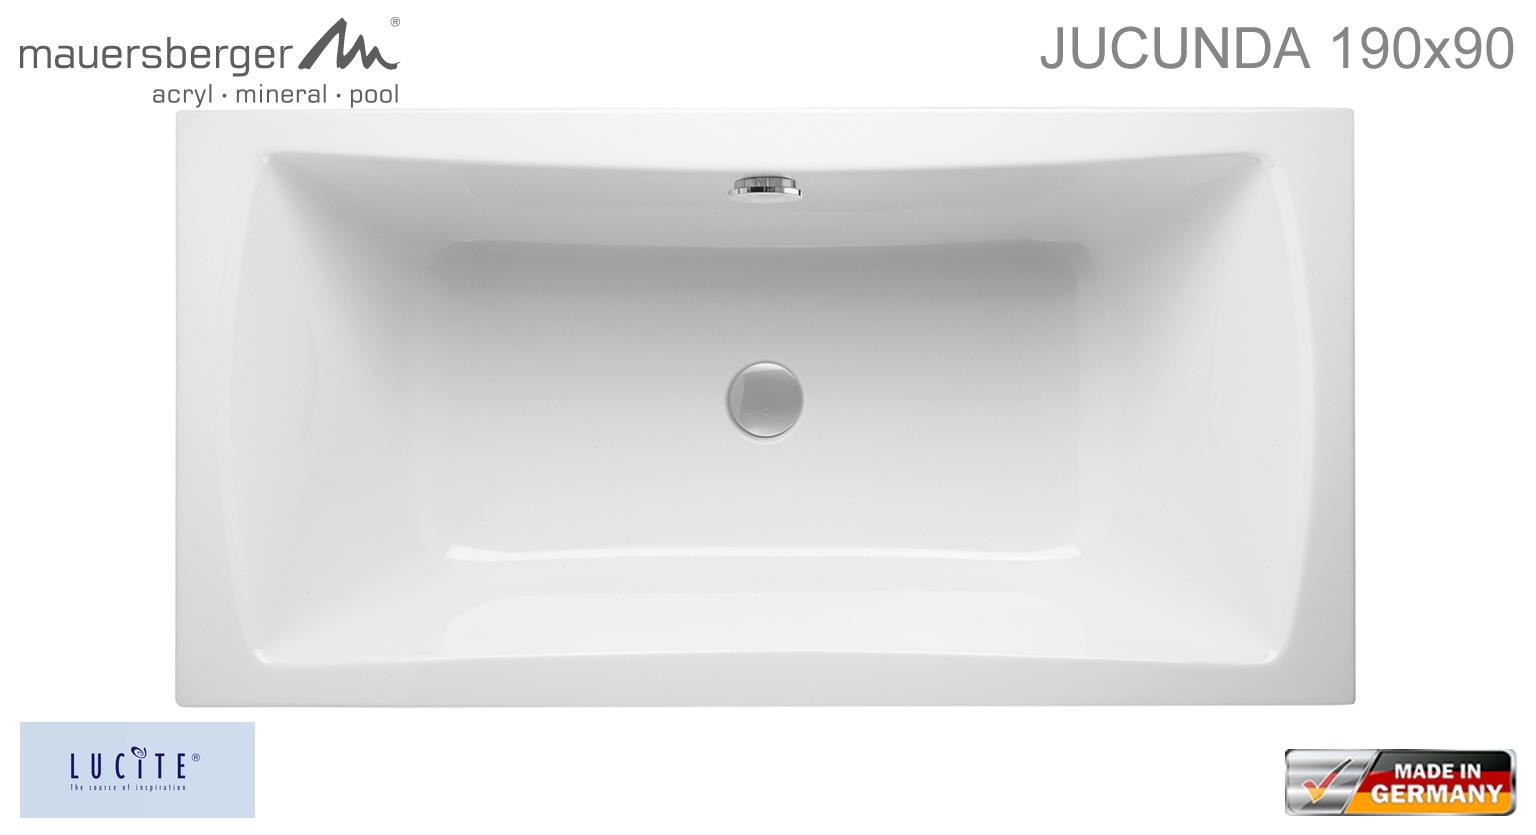 mauersberger badewanne jucunda 190 x 90 cm rechteck acryl impulsbad. Black Bedroom Furniture Sets. Home Design Ideas